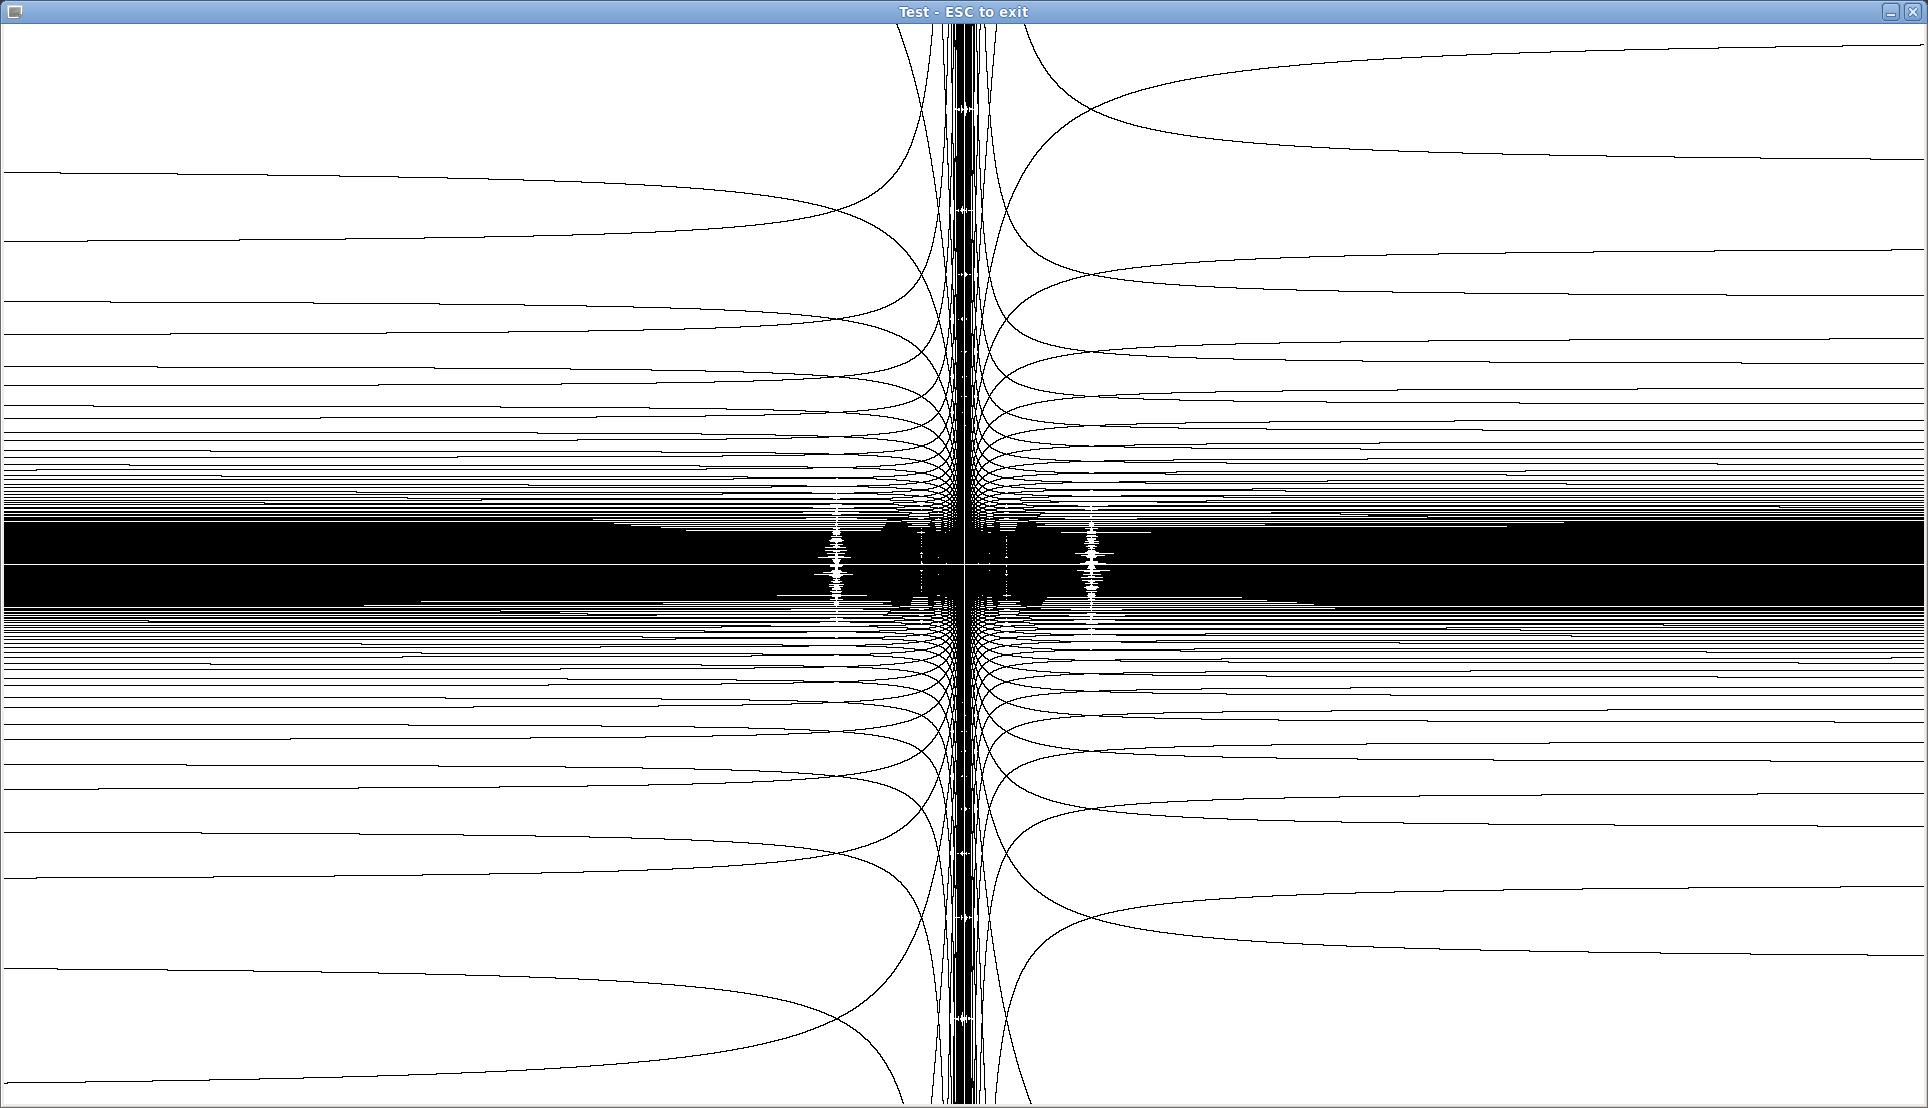 lattice 2x2, rendered in  110s